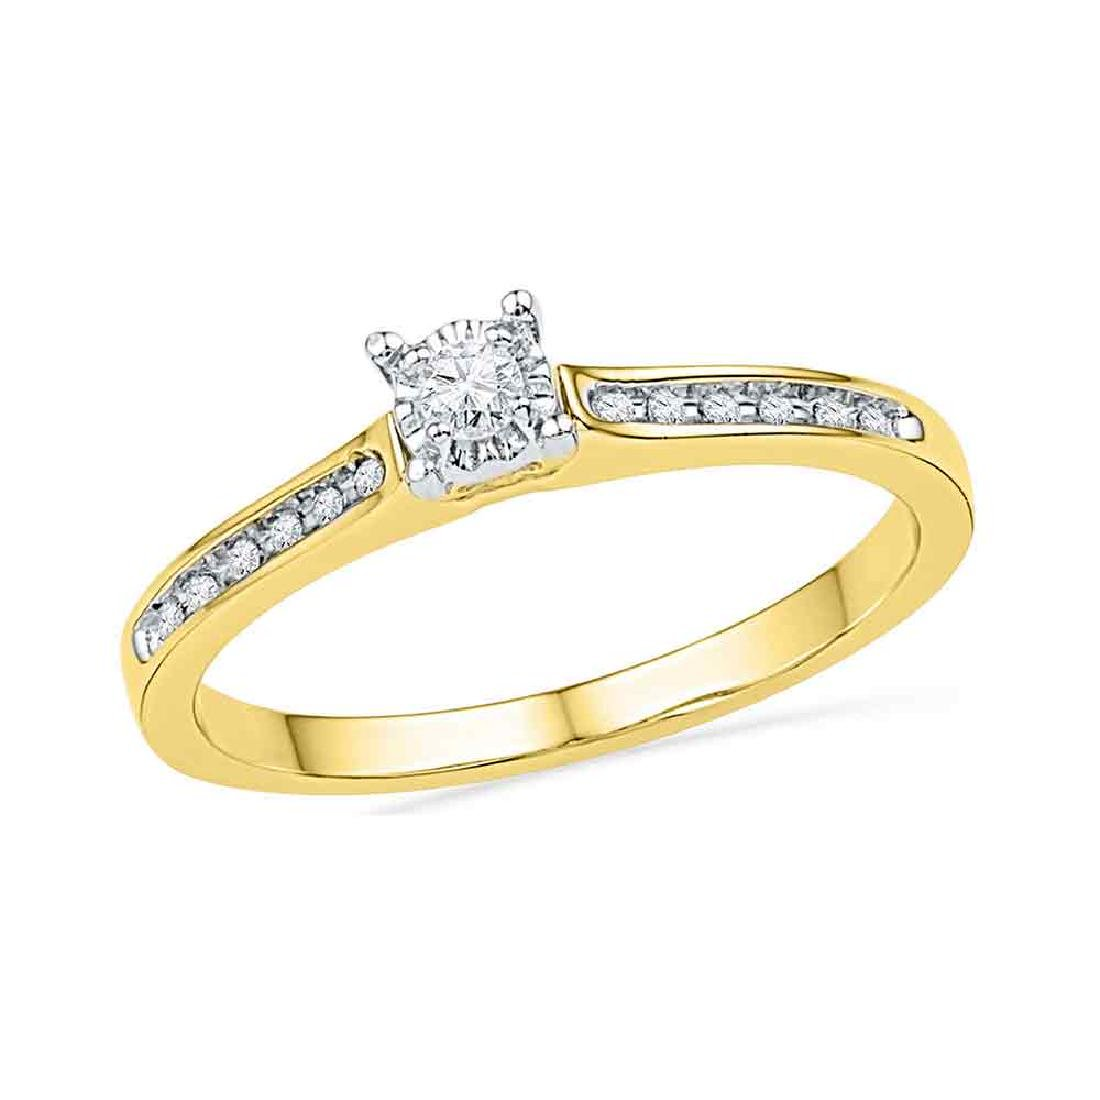 0.10 CTW Diamond Solitaire Bridal Engagement Ring 10KT